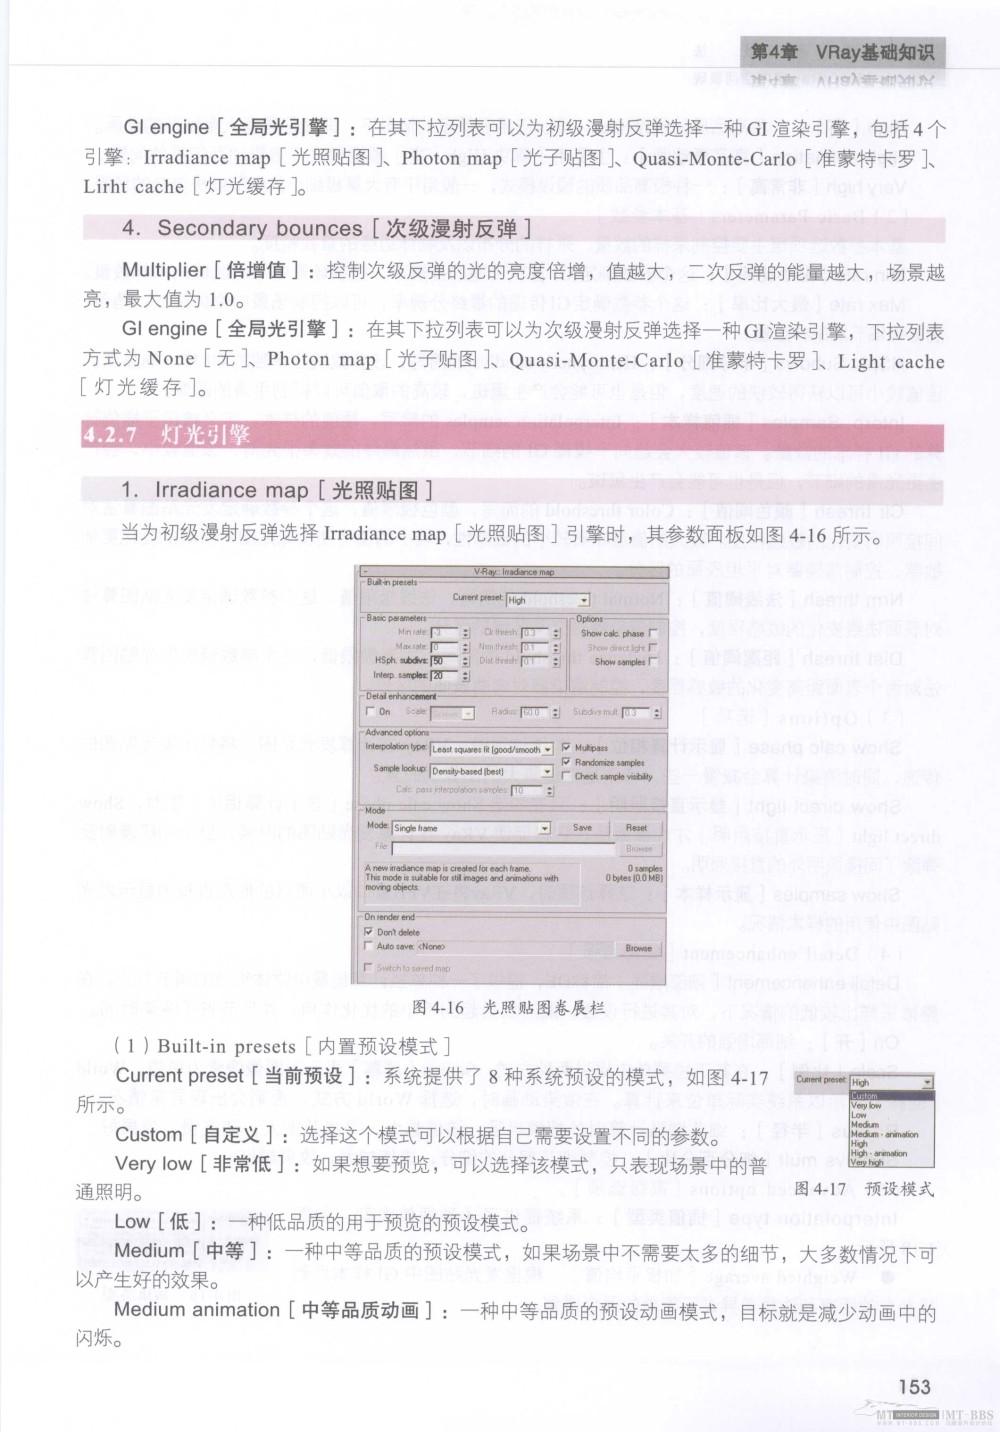 水晶石技法-3ds_Max&VRay室内空间表现_水晶石技法-3ds_Max&VRay室内空间表现_页面_159.jpg